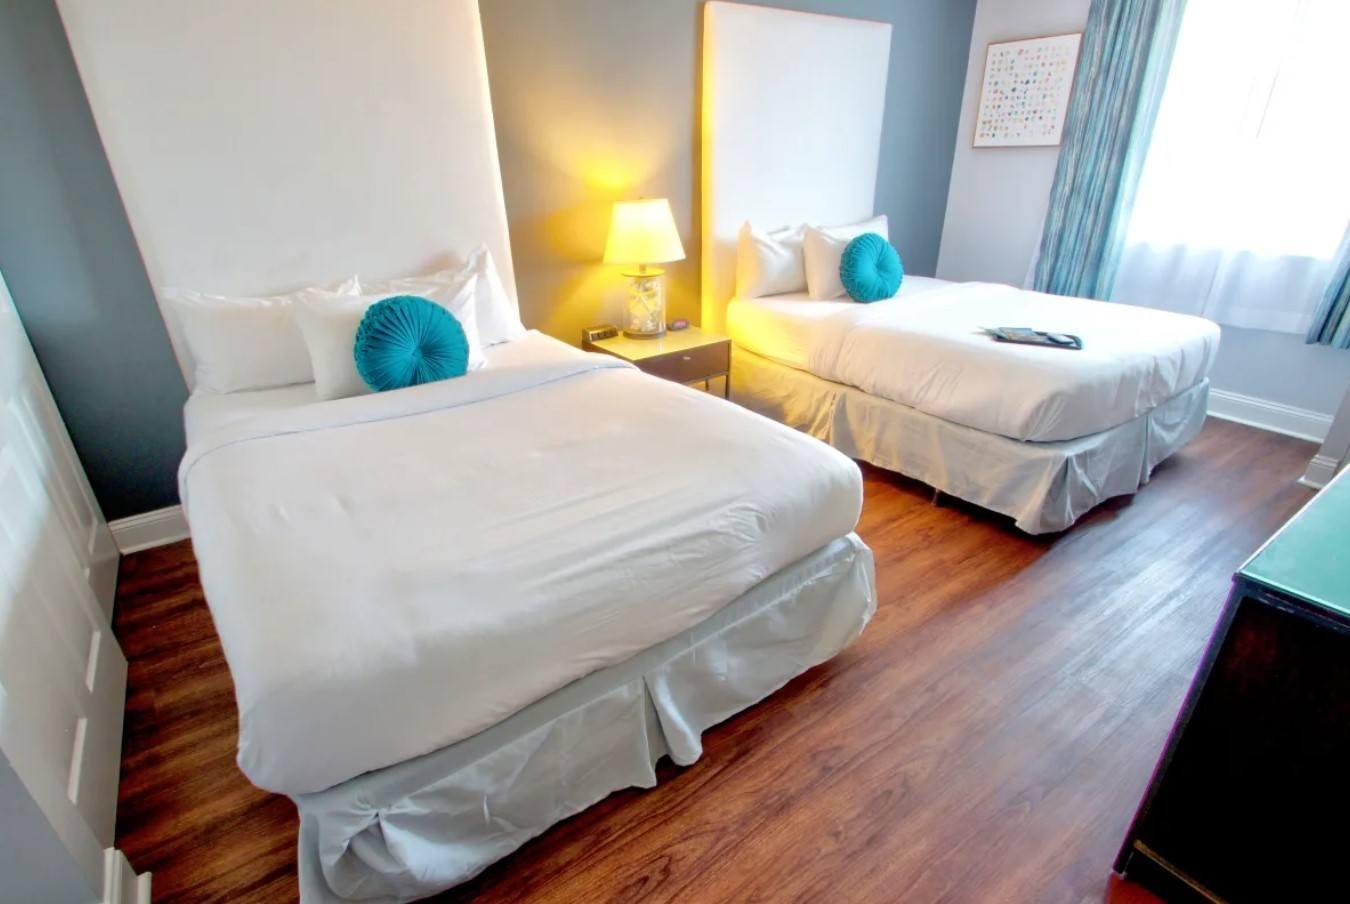 Fort Lauderdale Grand Hotel best hostel in Fort Lauderdale